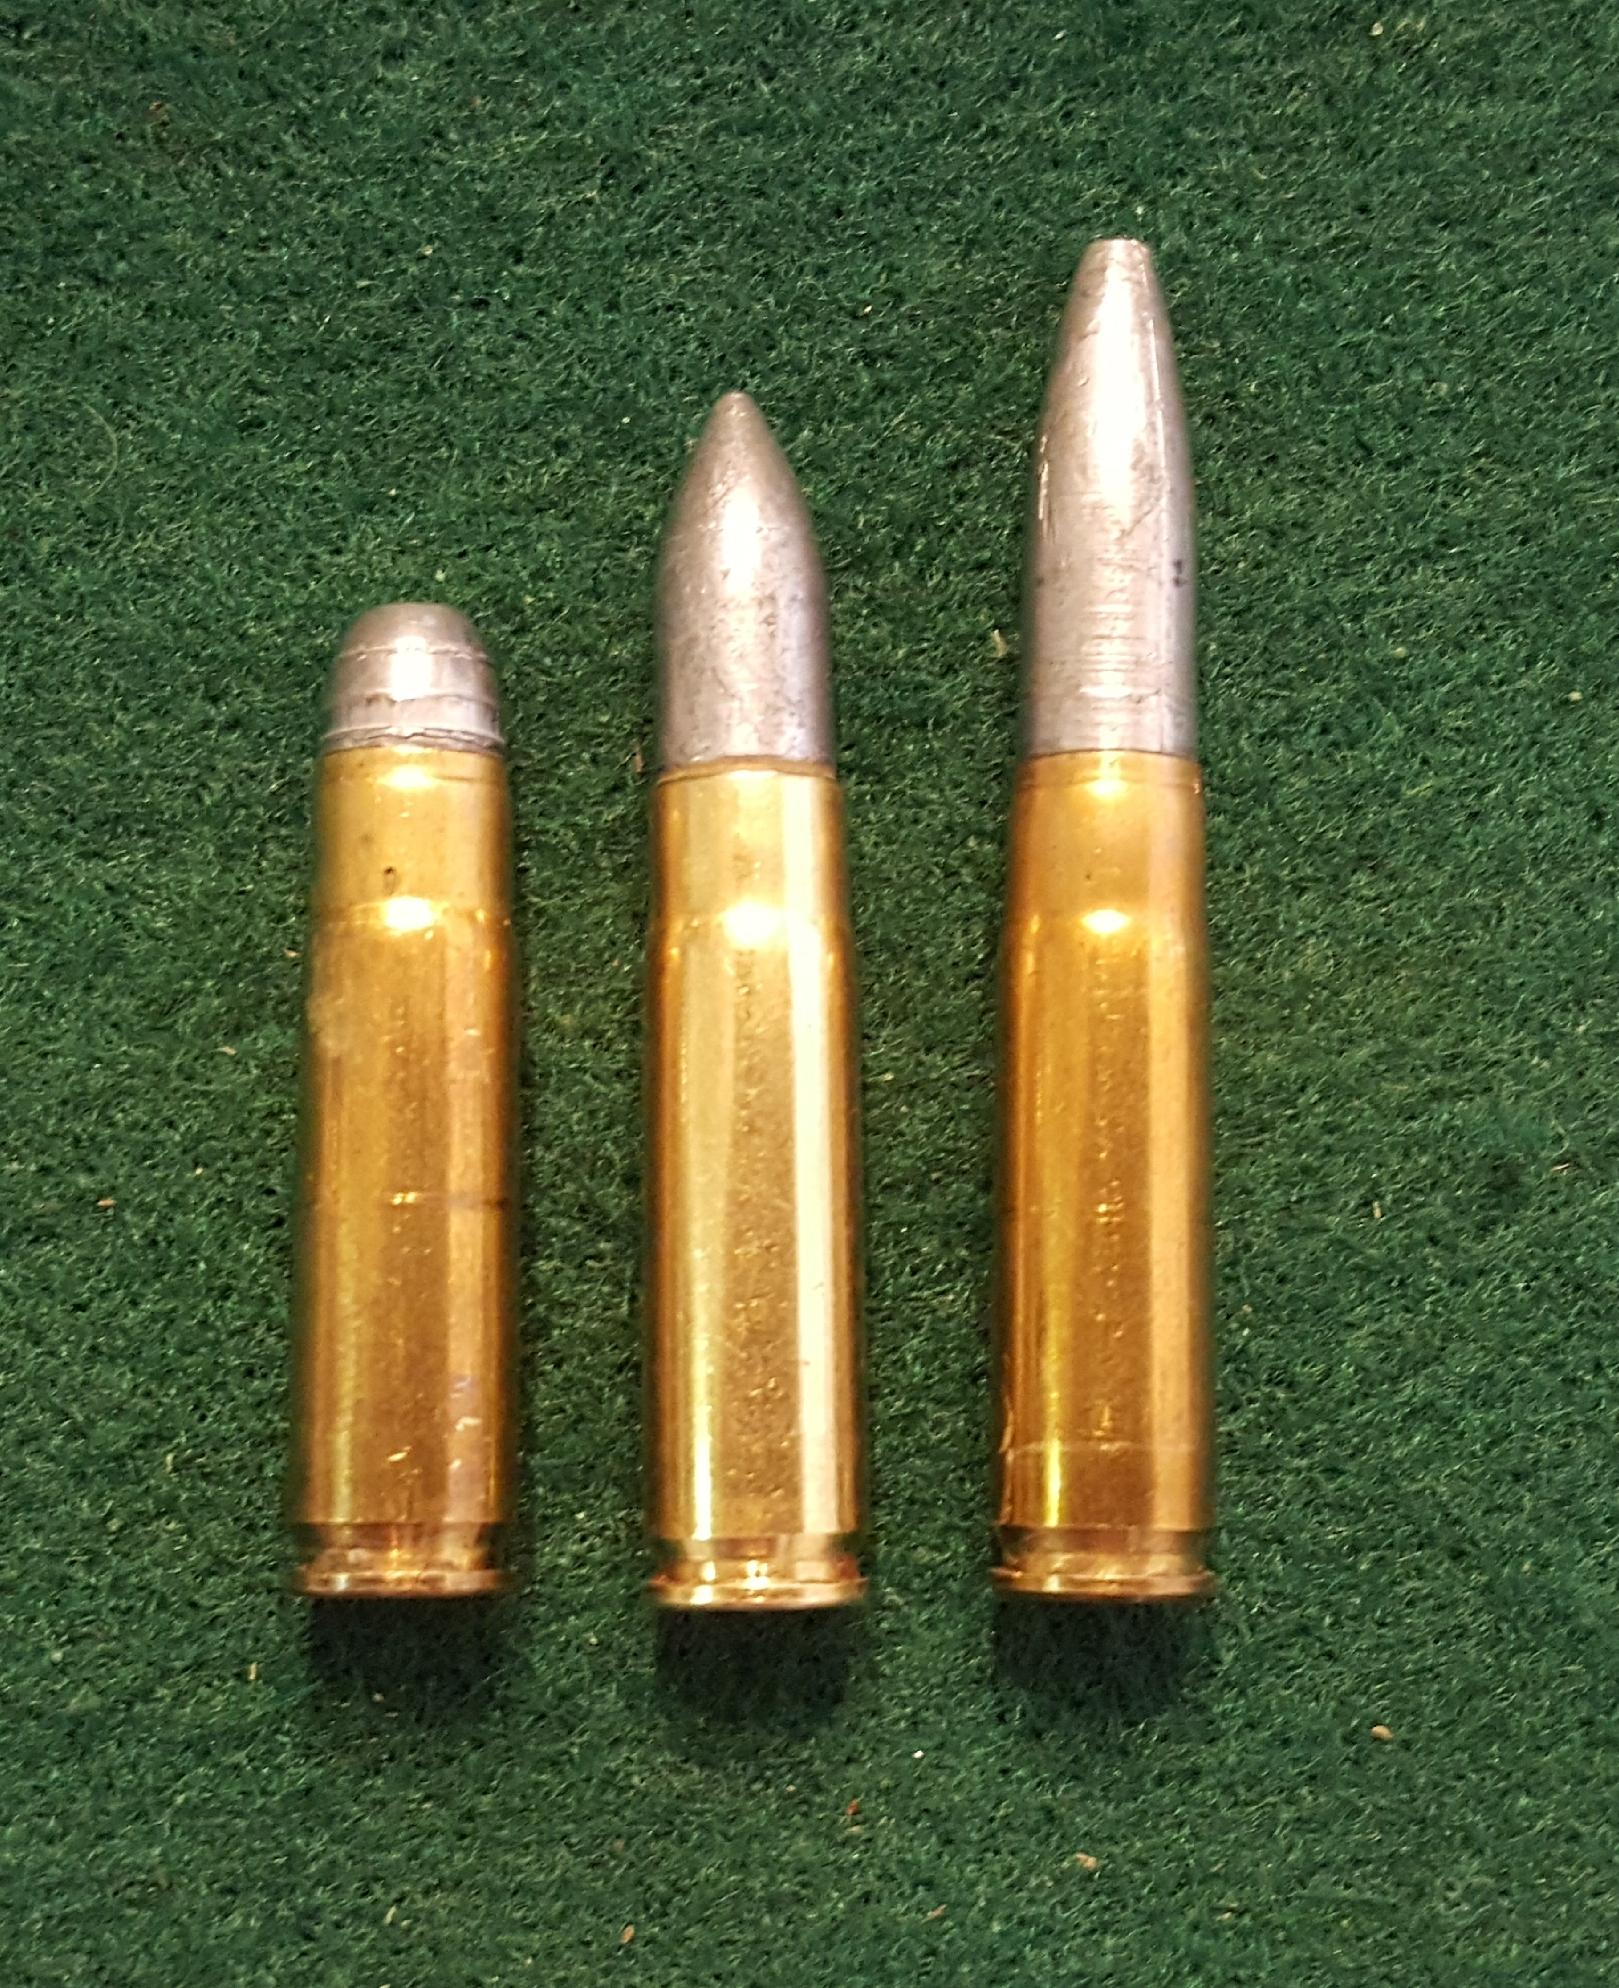 handirifle-ammo-1.jpg